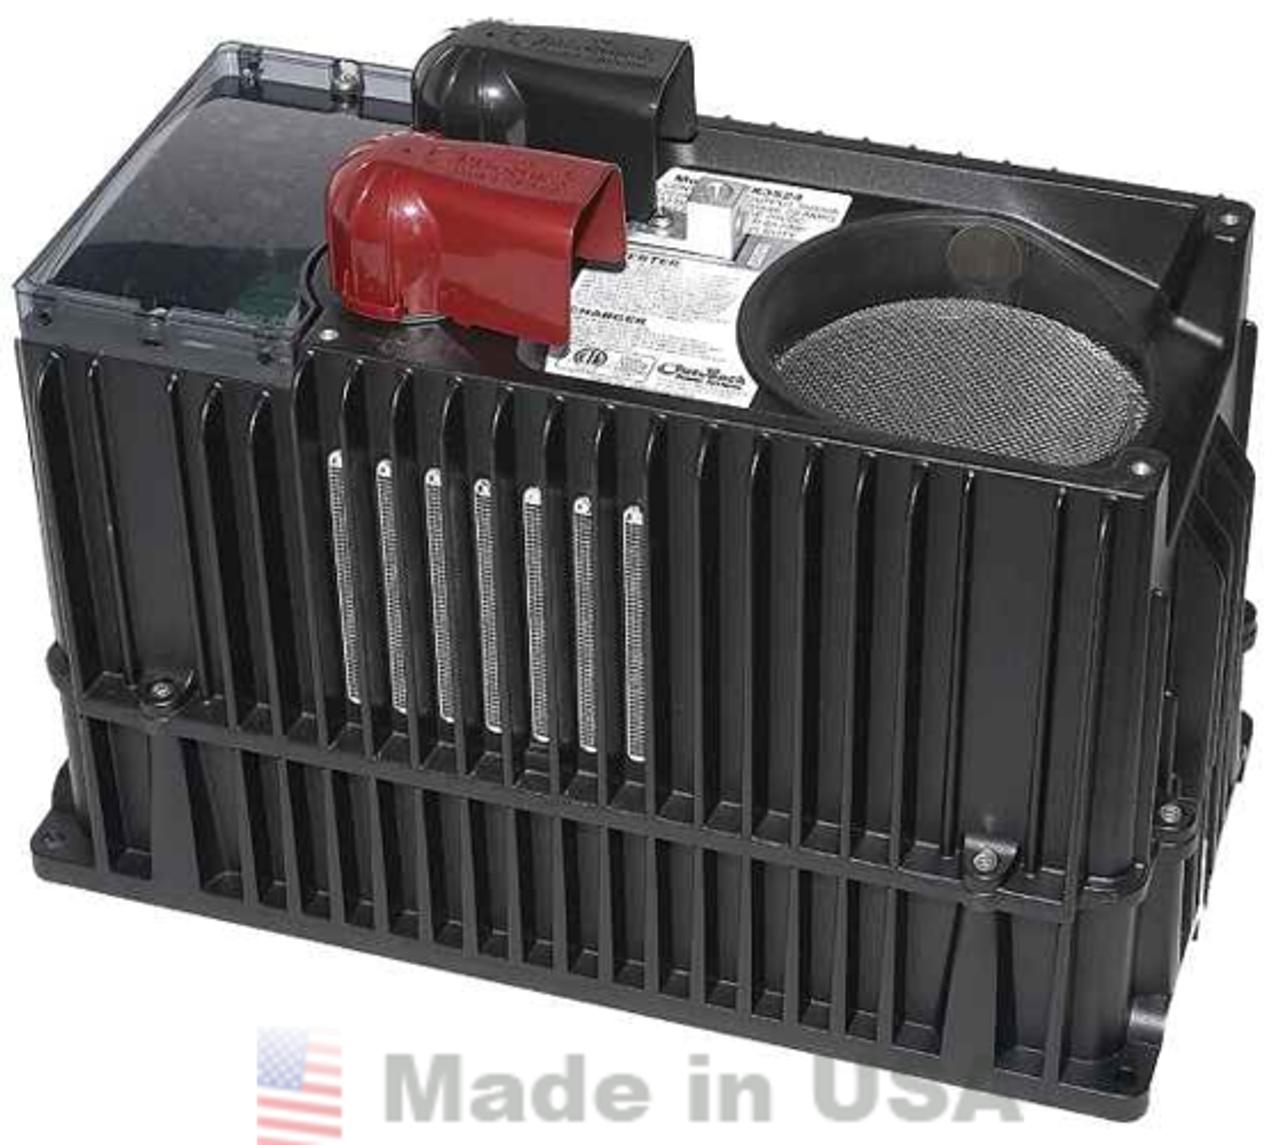 Outback Power VFX3048E 3000W, 48V DC, 230V AC, 50Hz Sine Wave Inverter